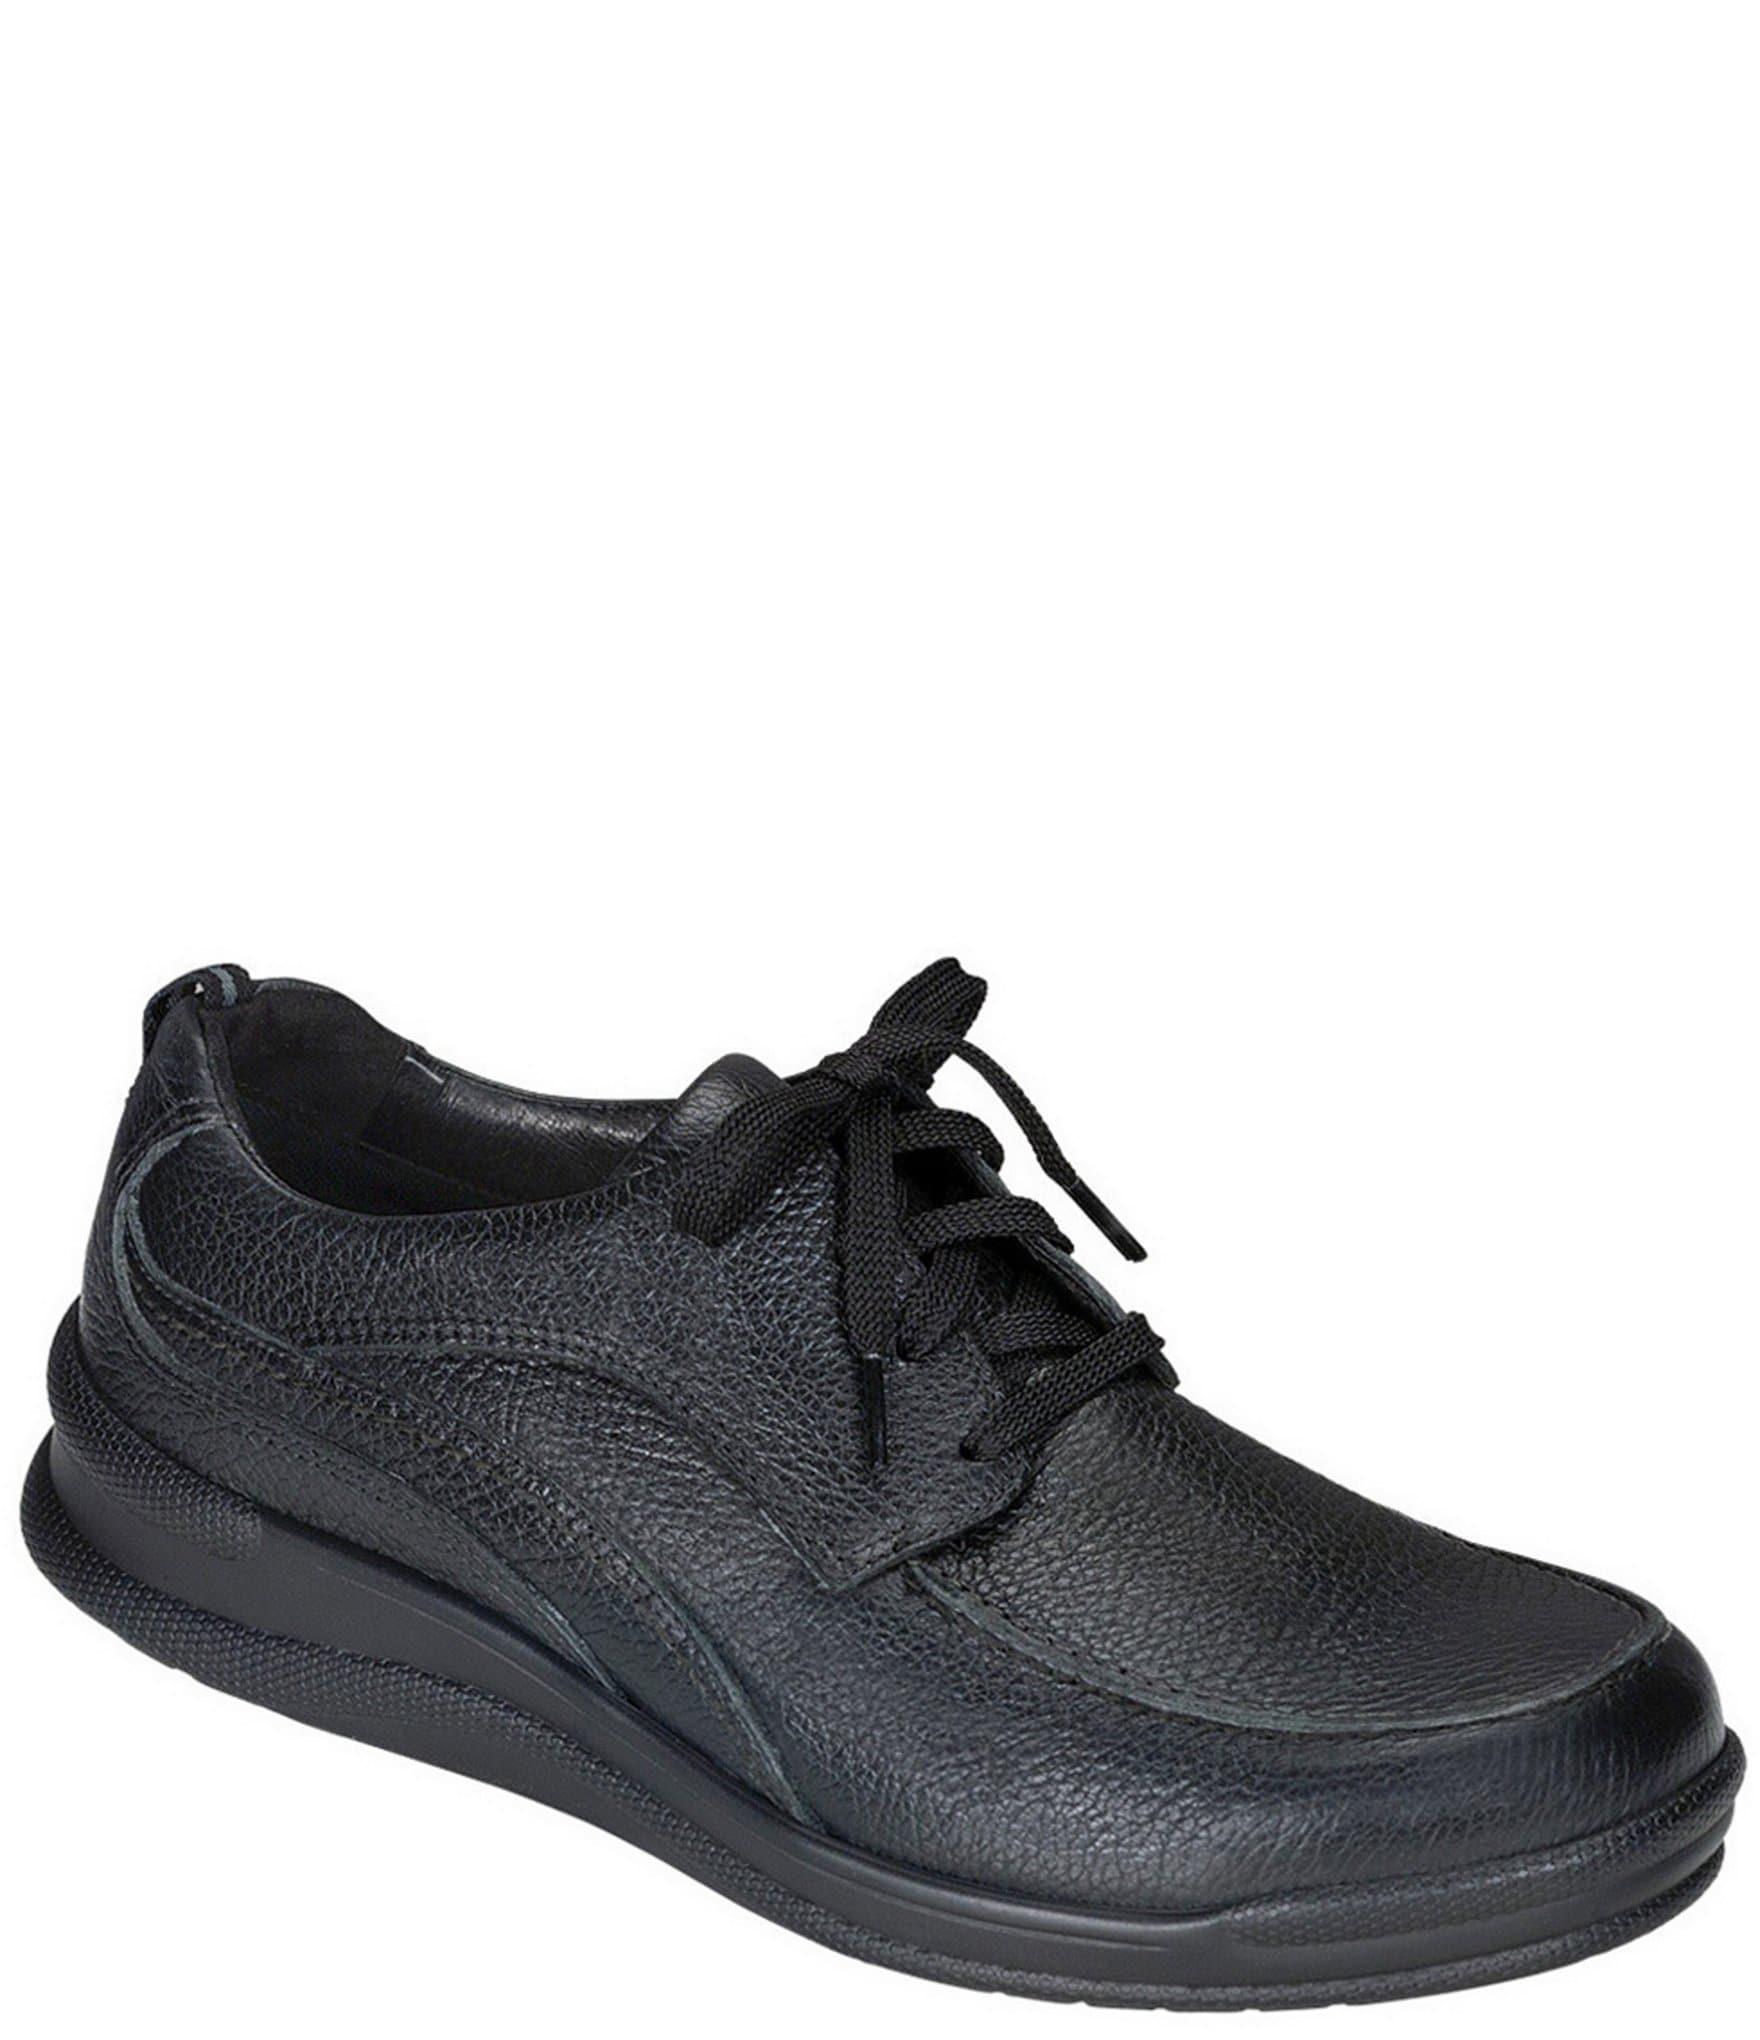 SAS Men's Move On Lace Up Walking Shoes